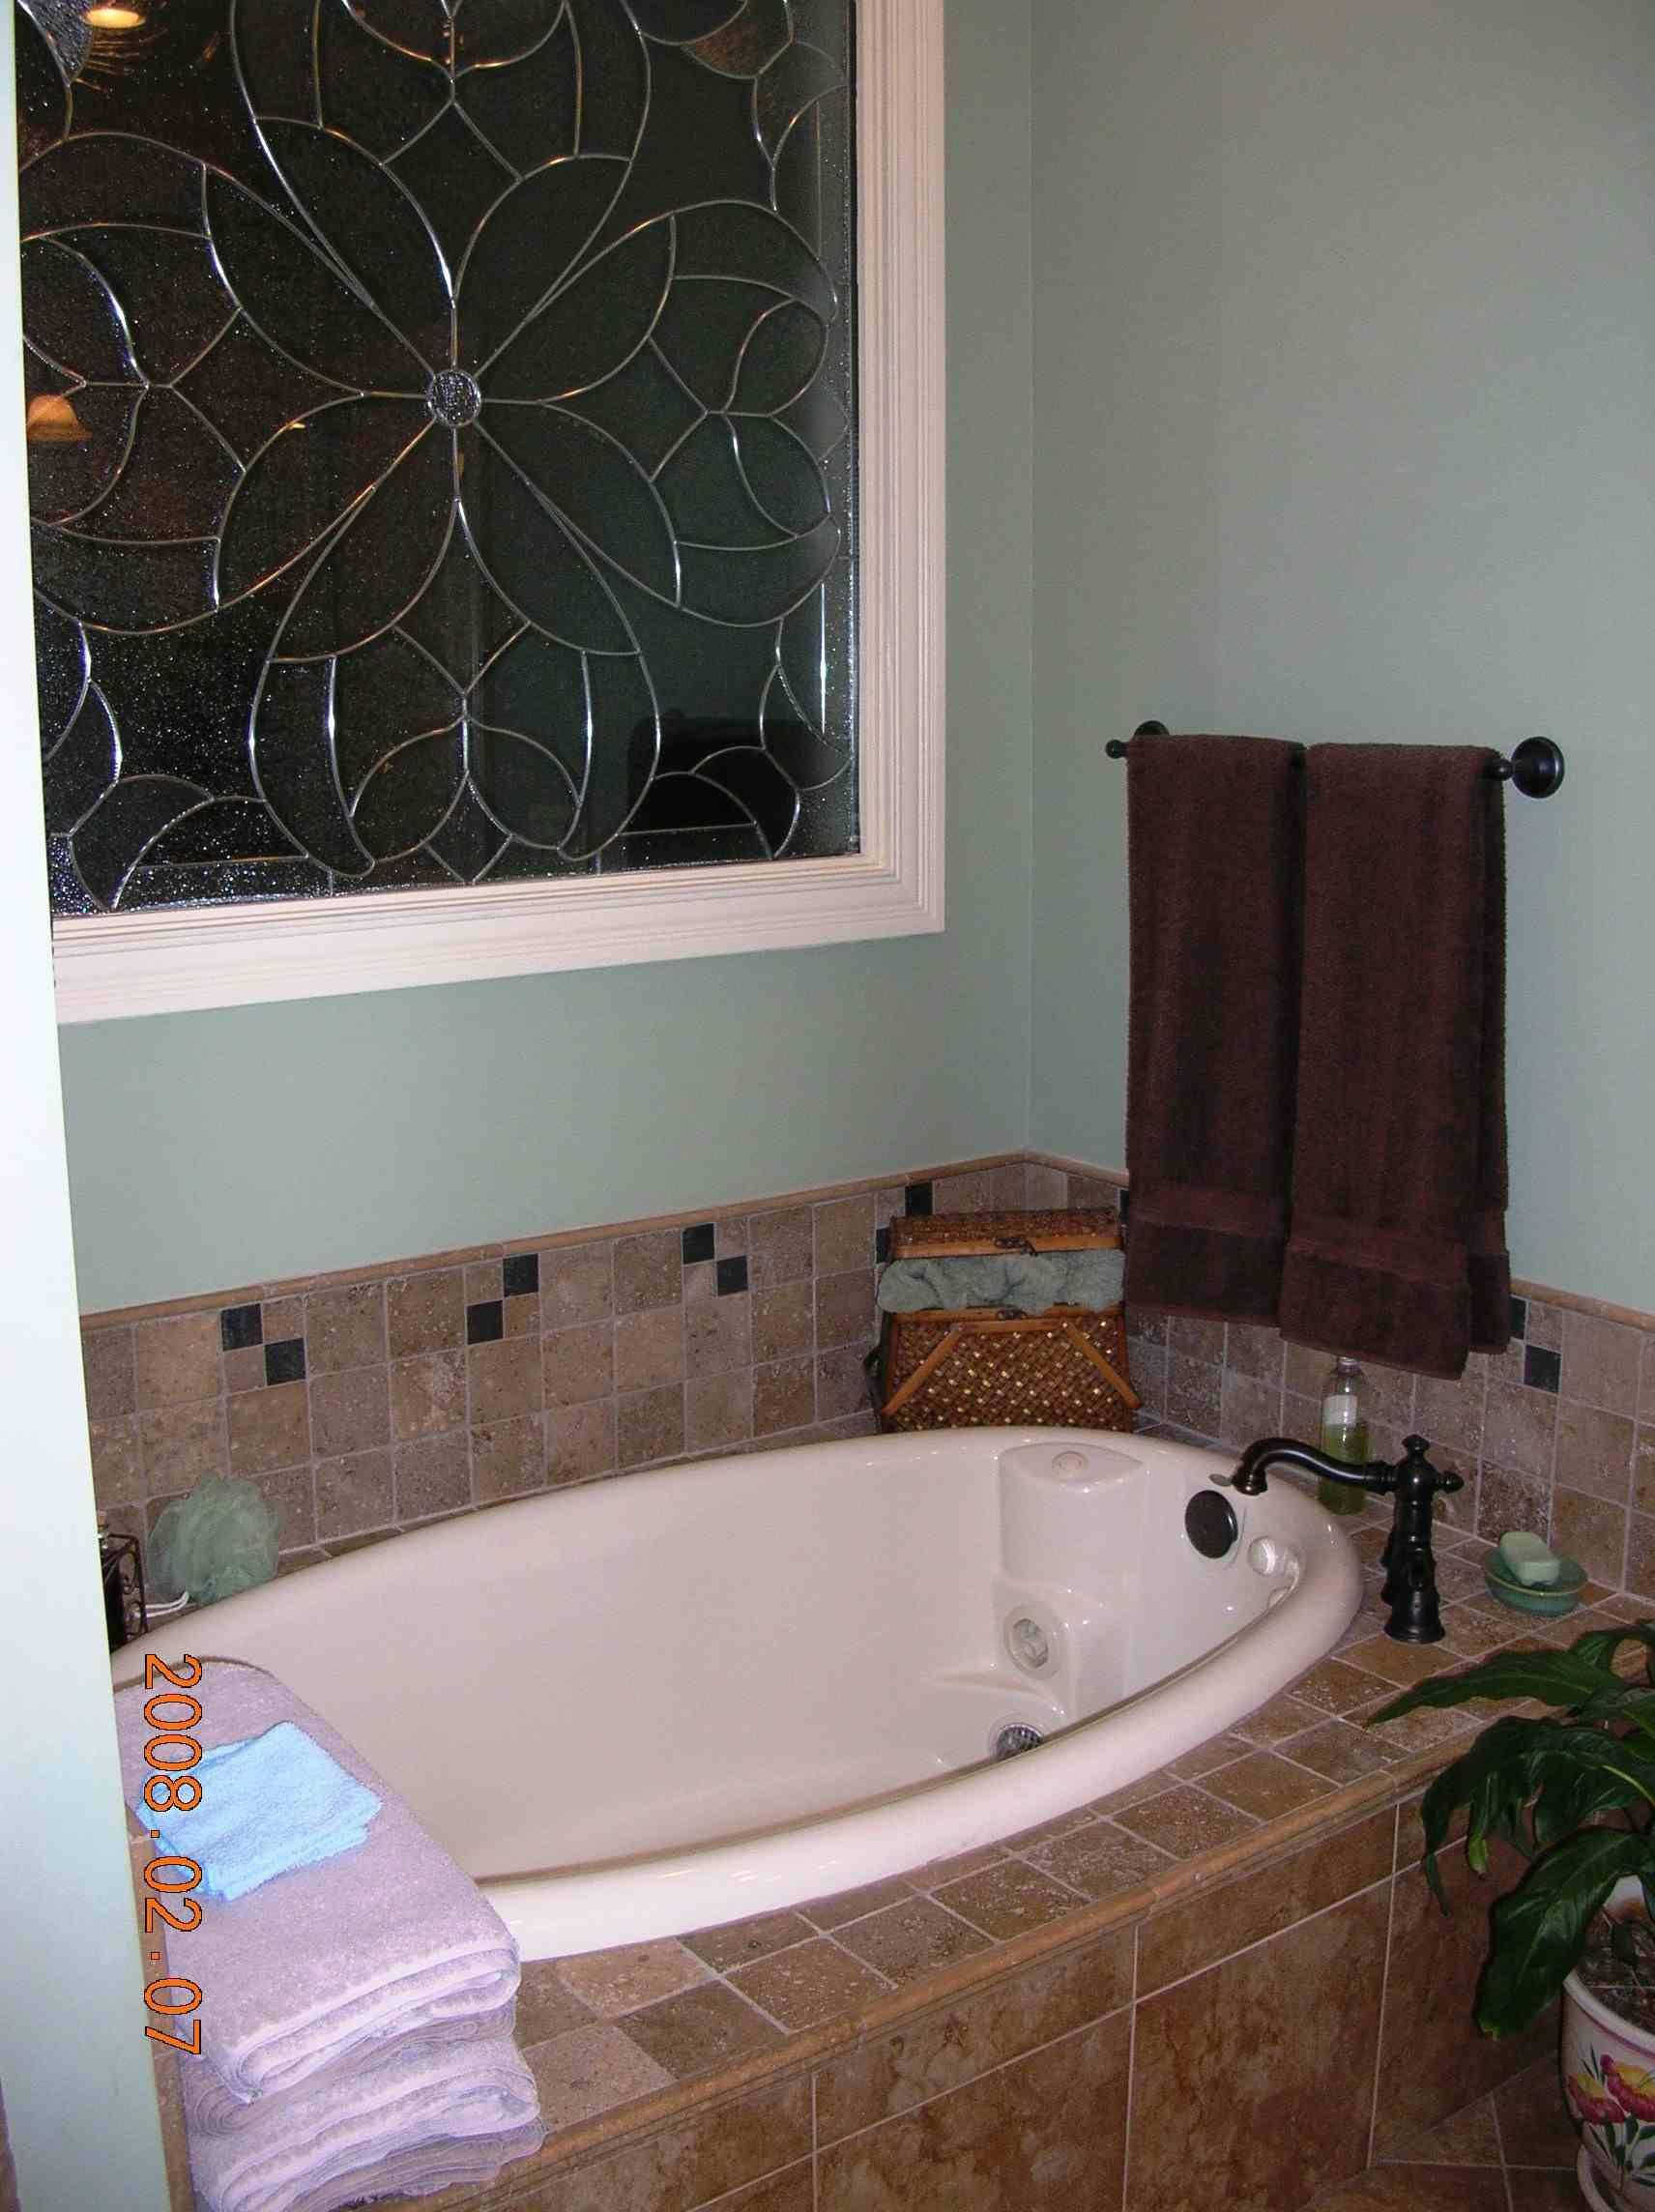 bathtub tile surround | Bathrooms remodel, Bathtub tile ...